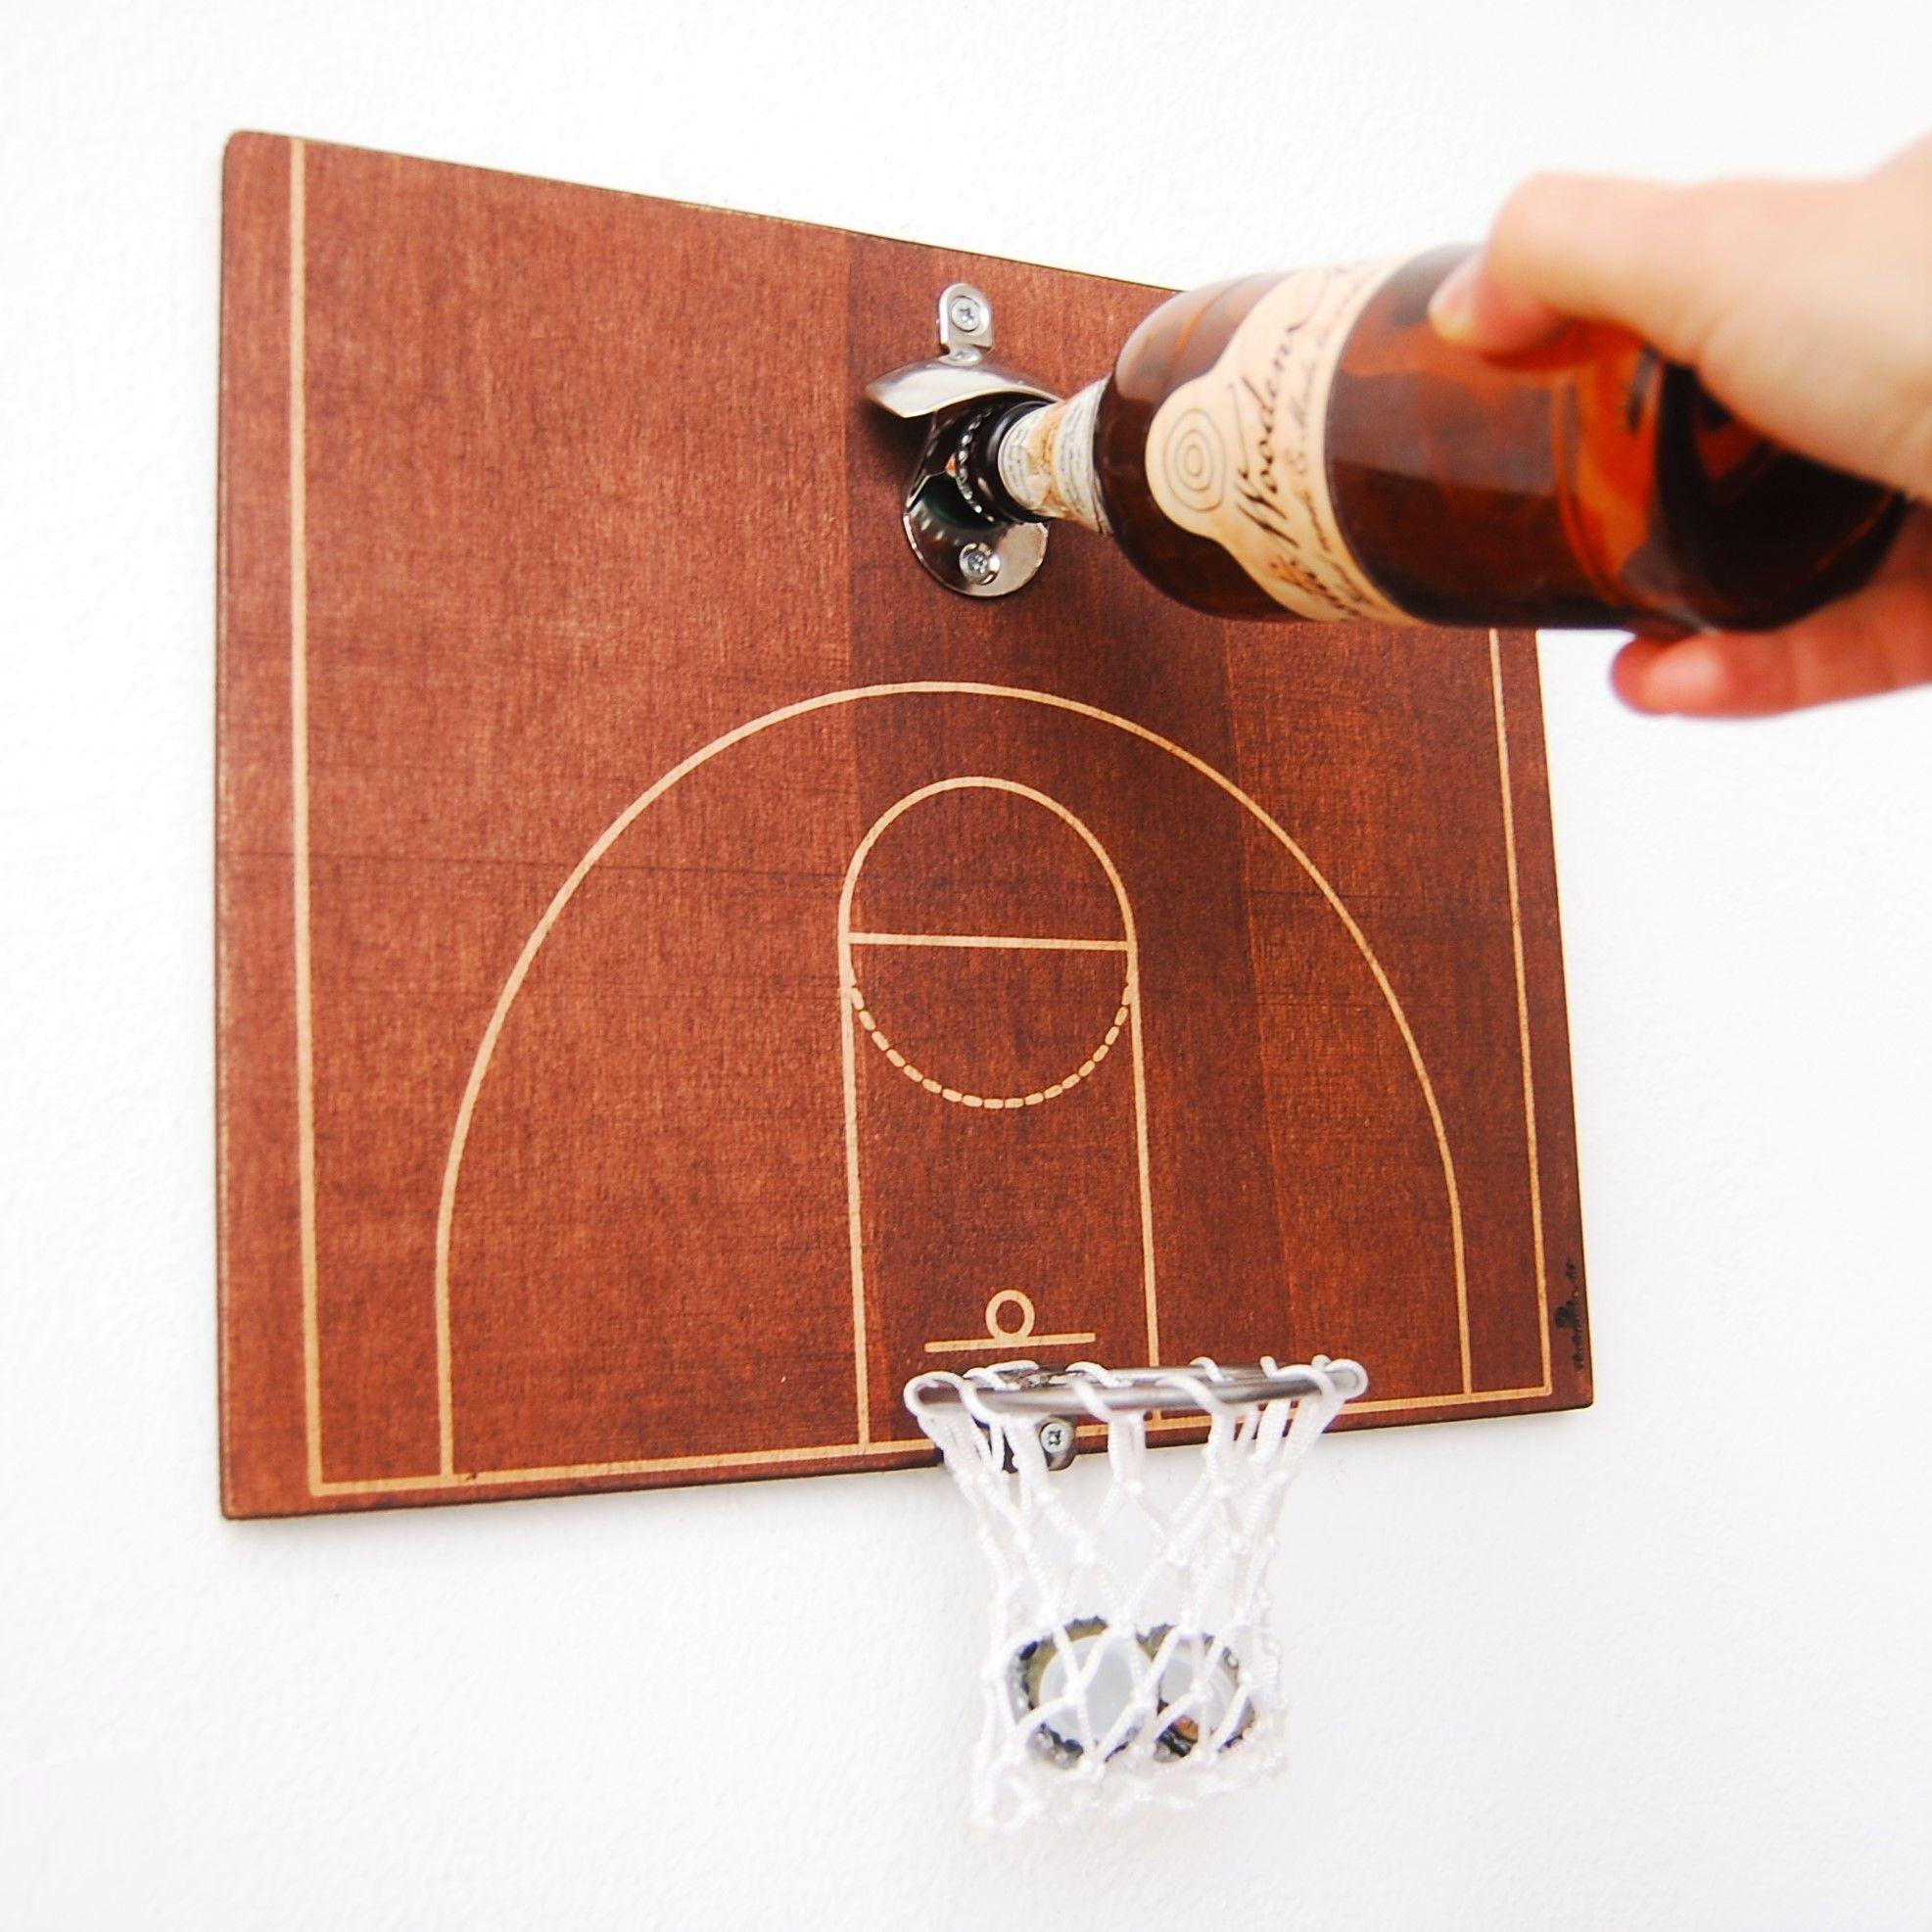 3 Point Shot Basketball Basketball Gift Bottle Opener Etsy In 2020 Beer Cap Crafts House Ceiling Design Bottle Opener